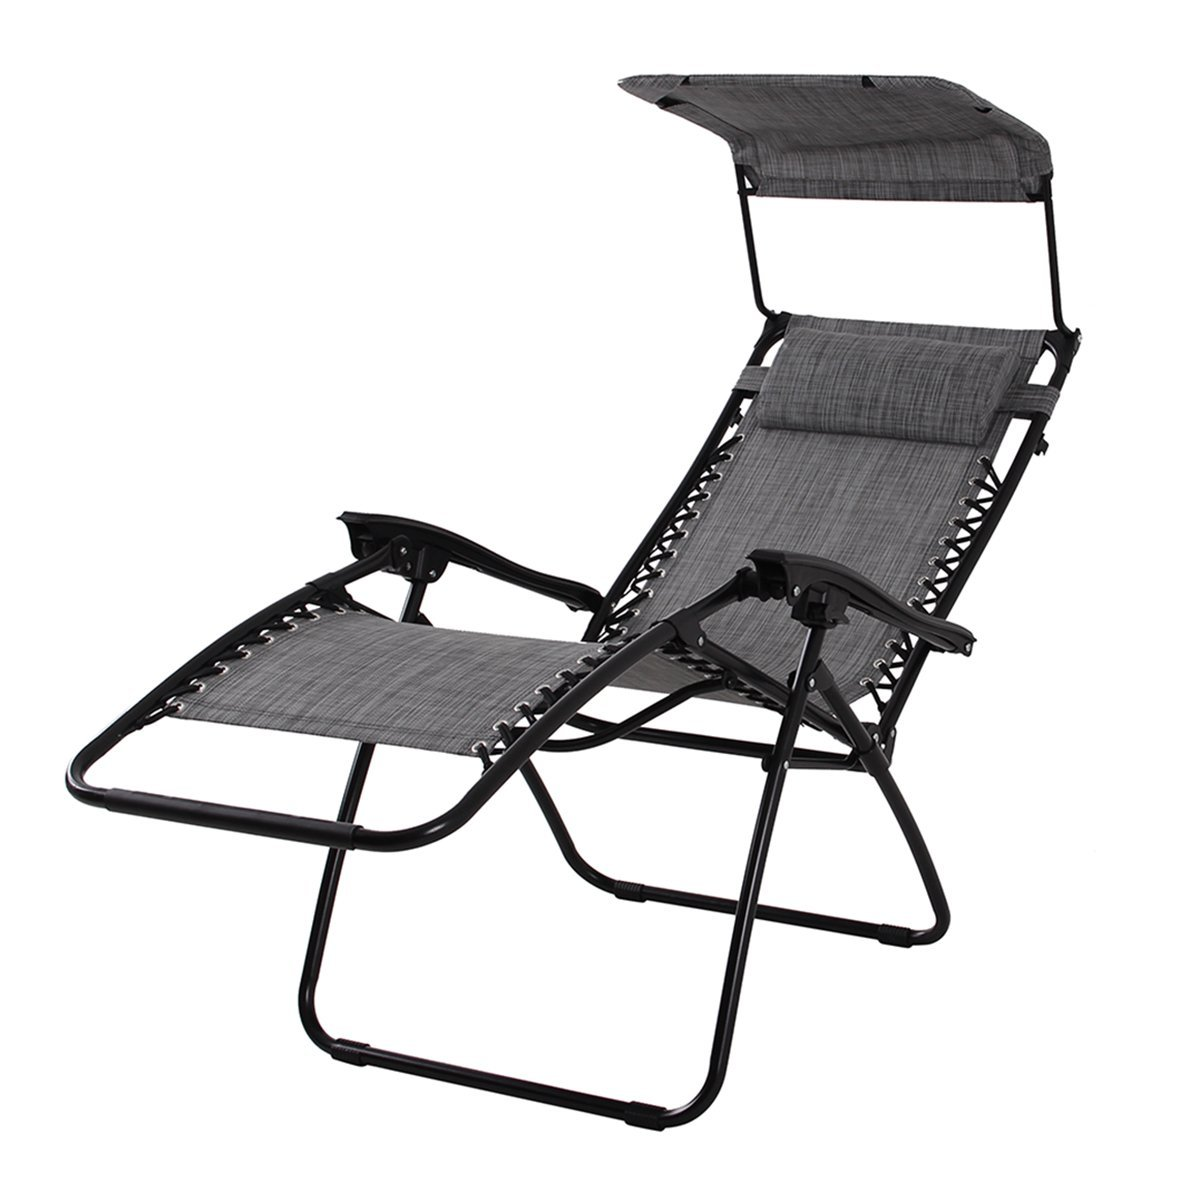 PHI VILLA Textilene Zero Gravity Lounge Chair Patio with Canopy Folding Adjustable Reclining Chair, Light Grey by PHI VILLA